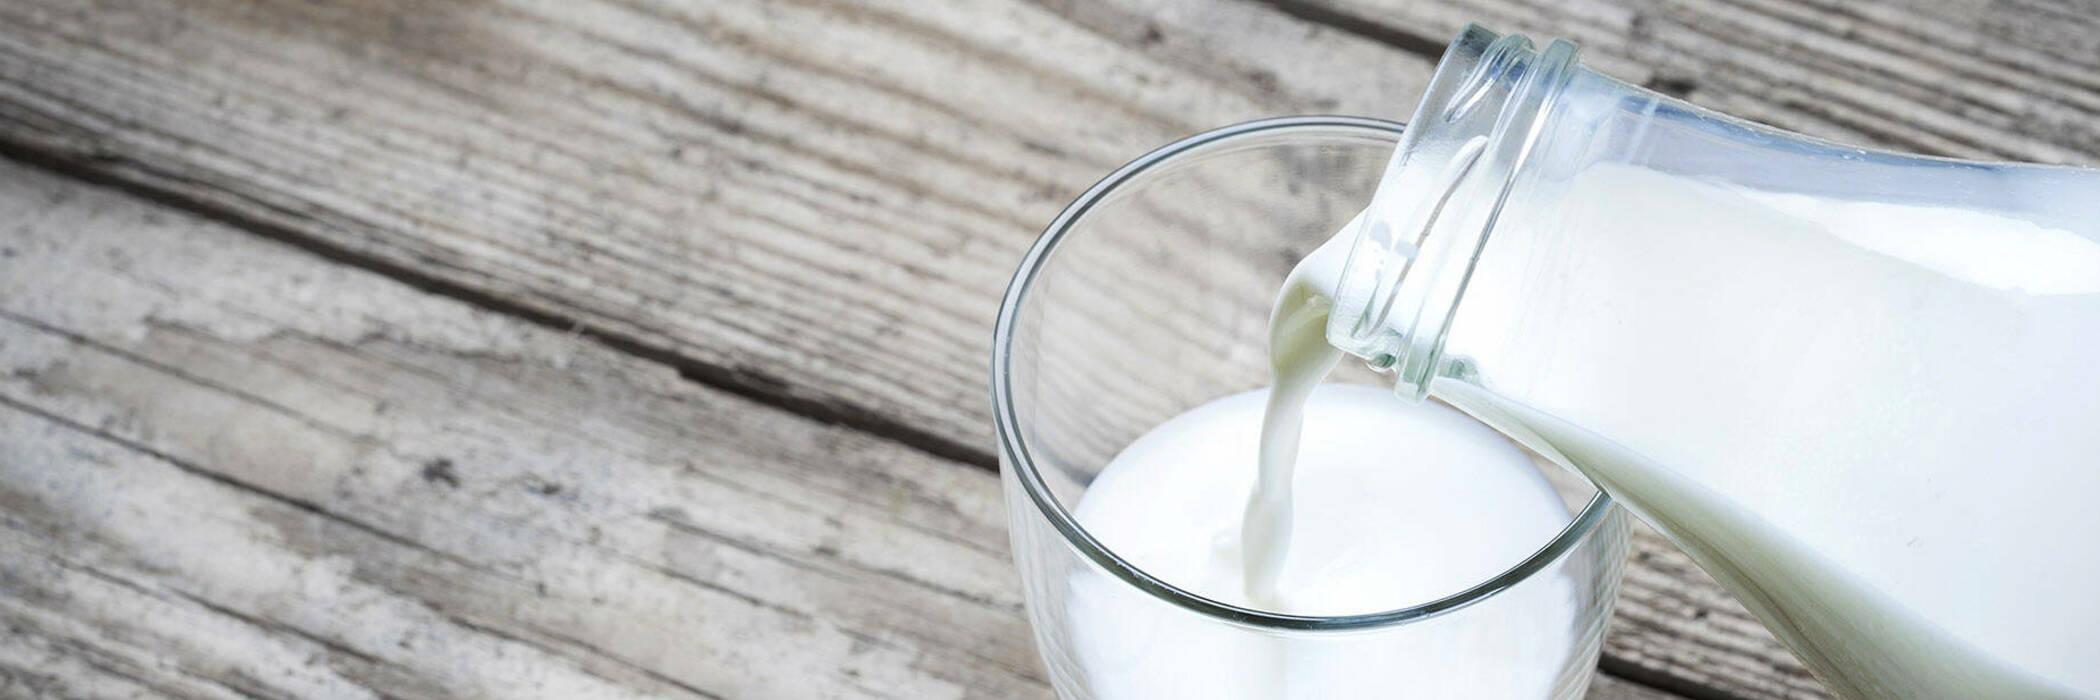 16may raw milk